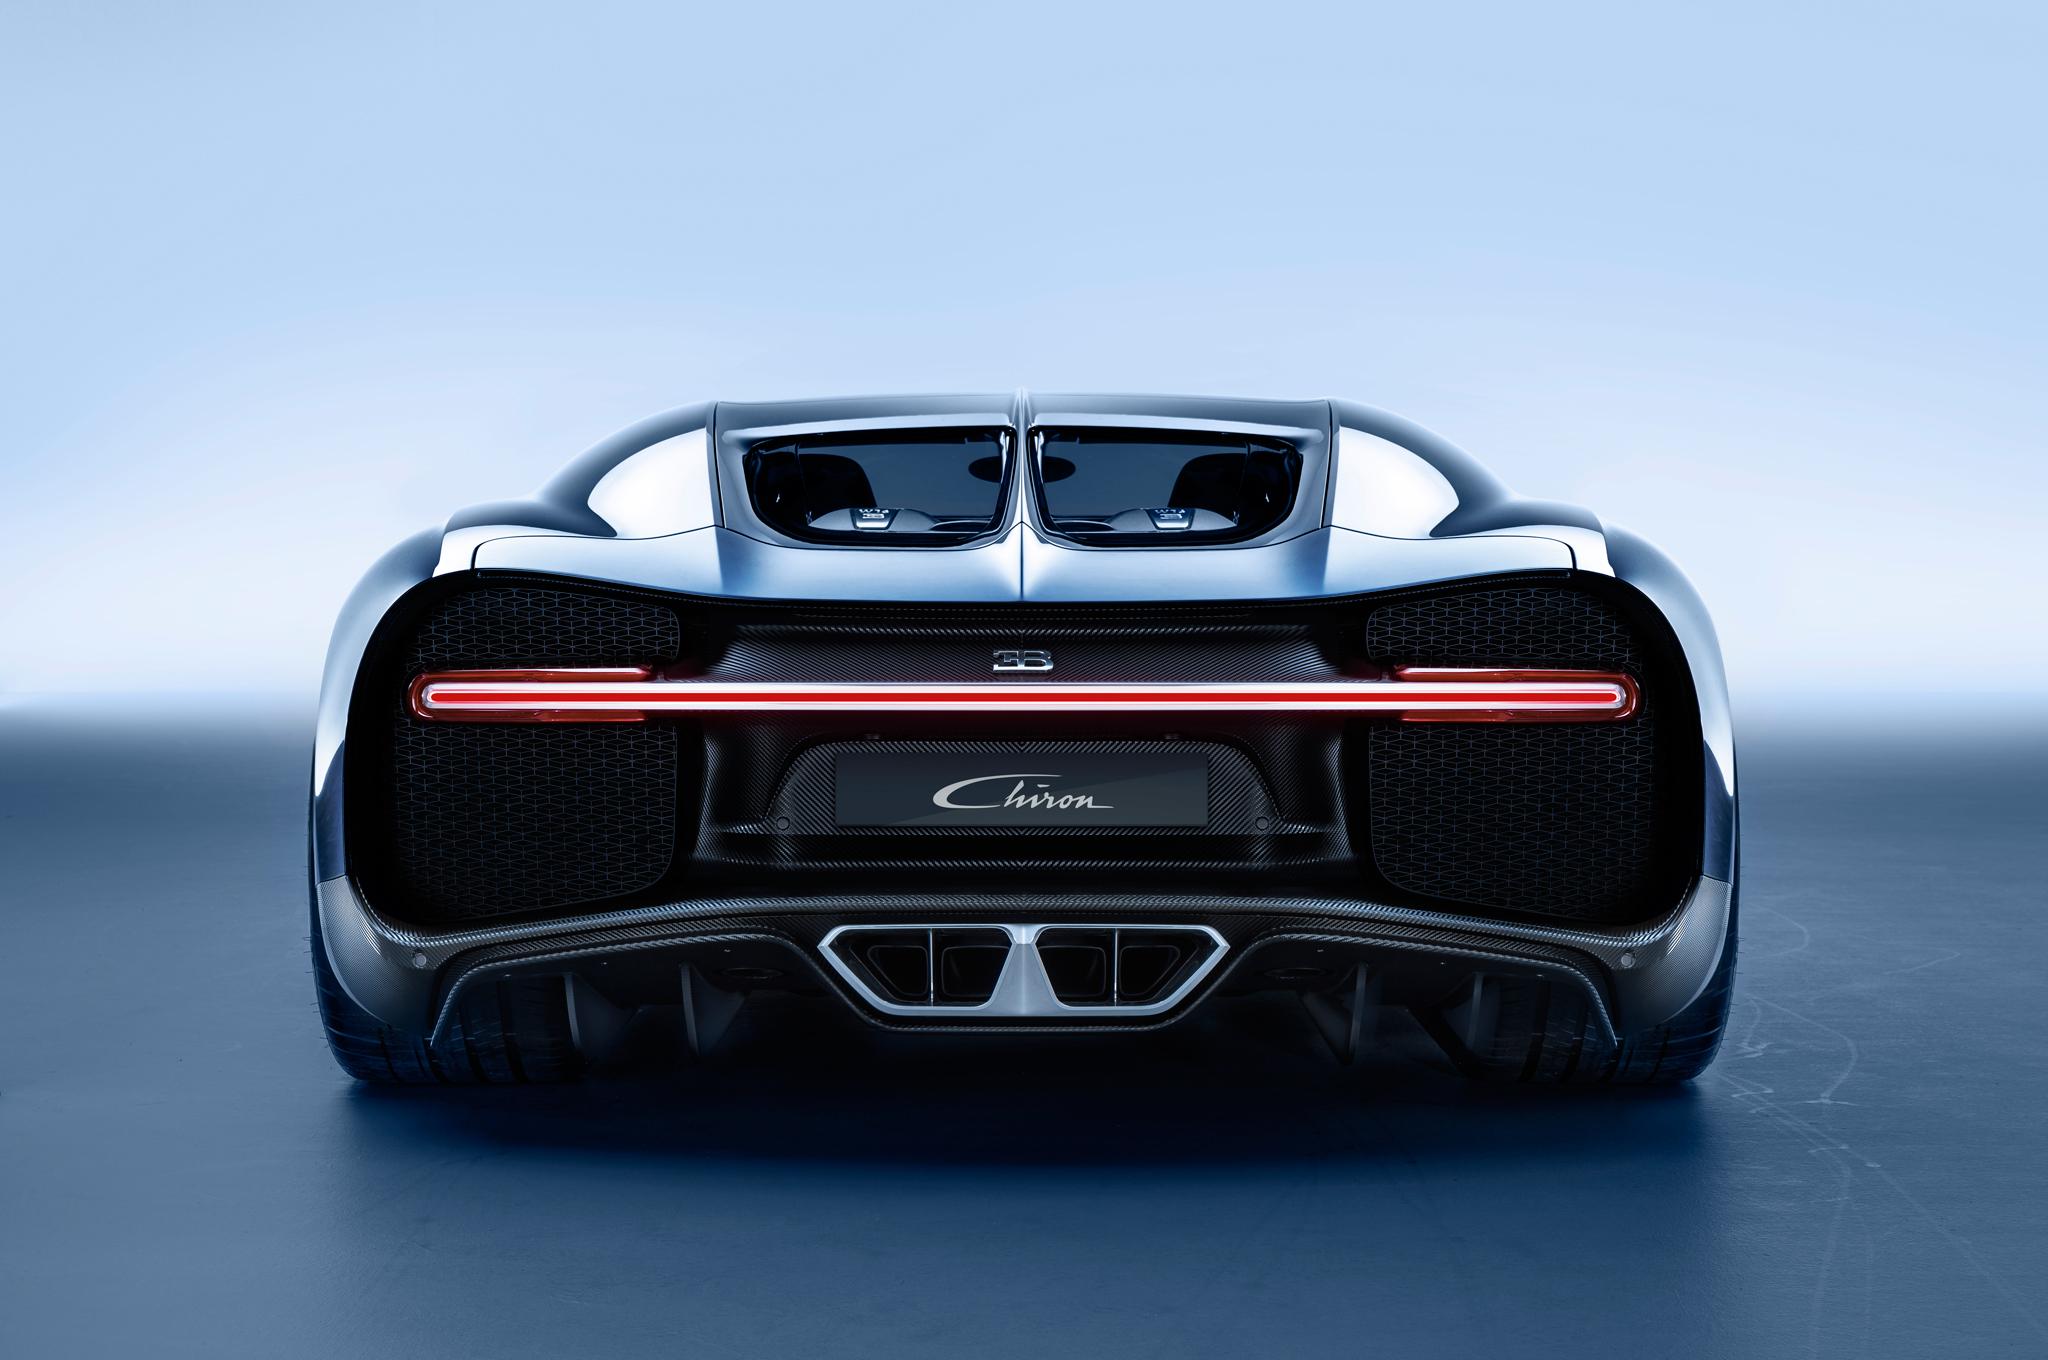 2017-Bugatti-Chiron-rear-end.jpg